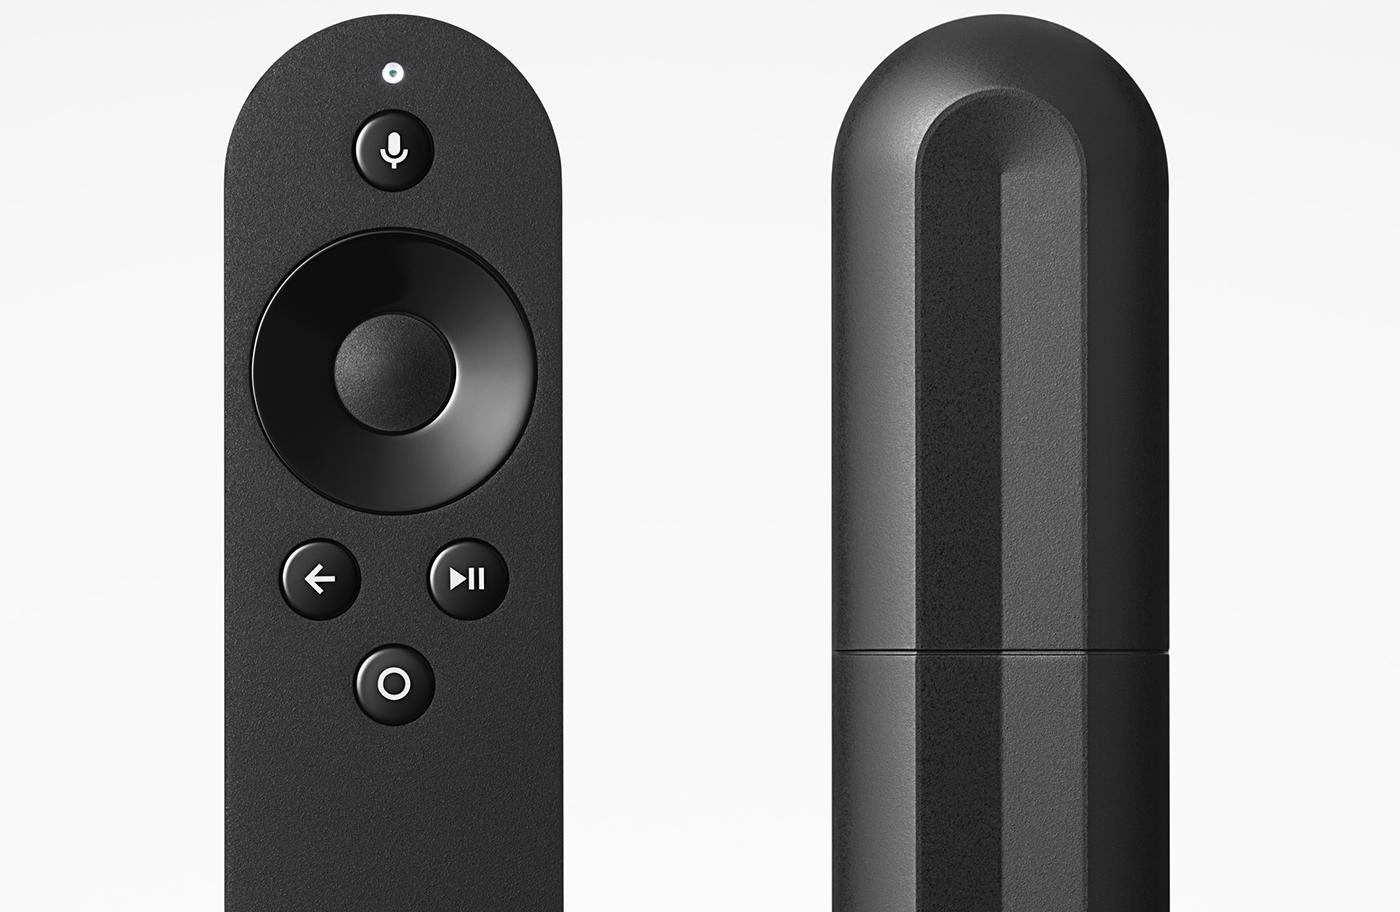 controle-remoto-nexus-player-microfone-comando-de-voz-reproducao-divulgacao-blog-geek-publicitario